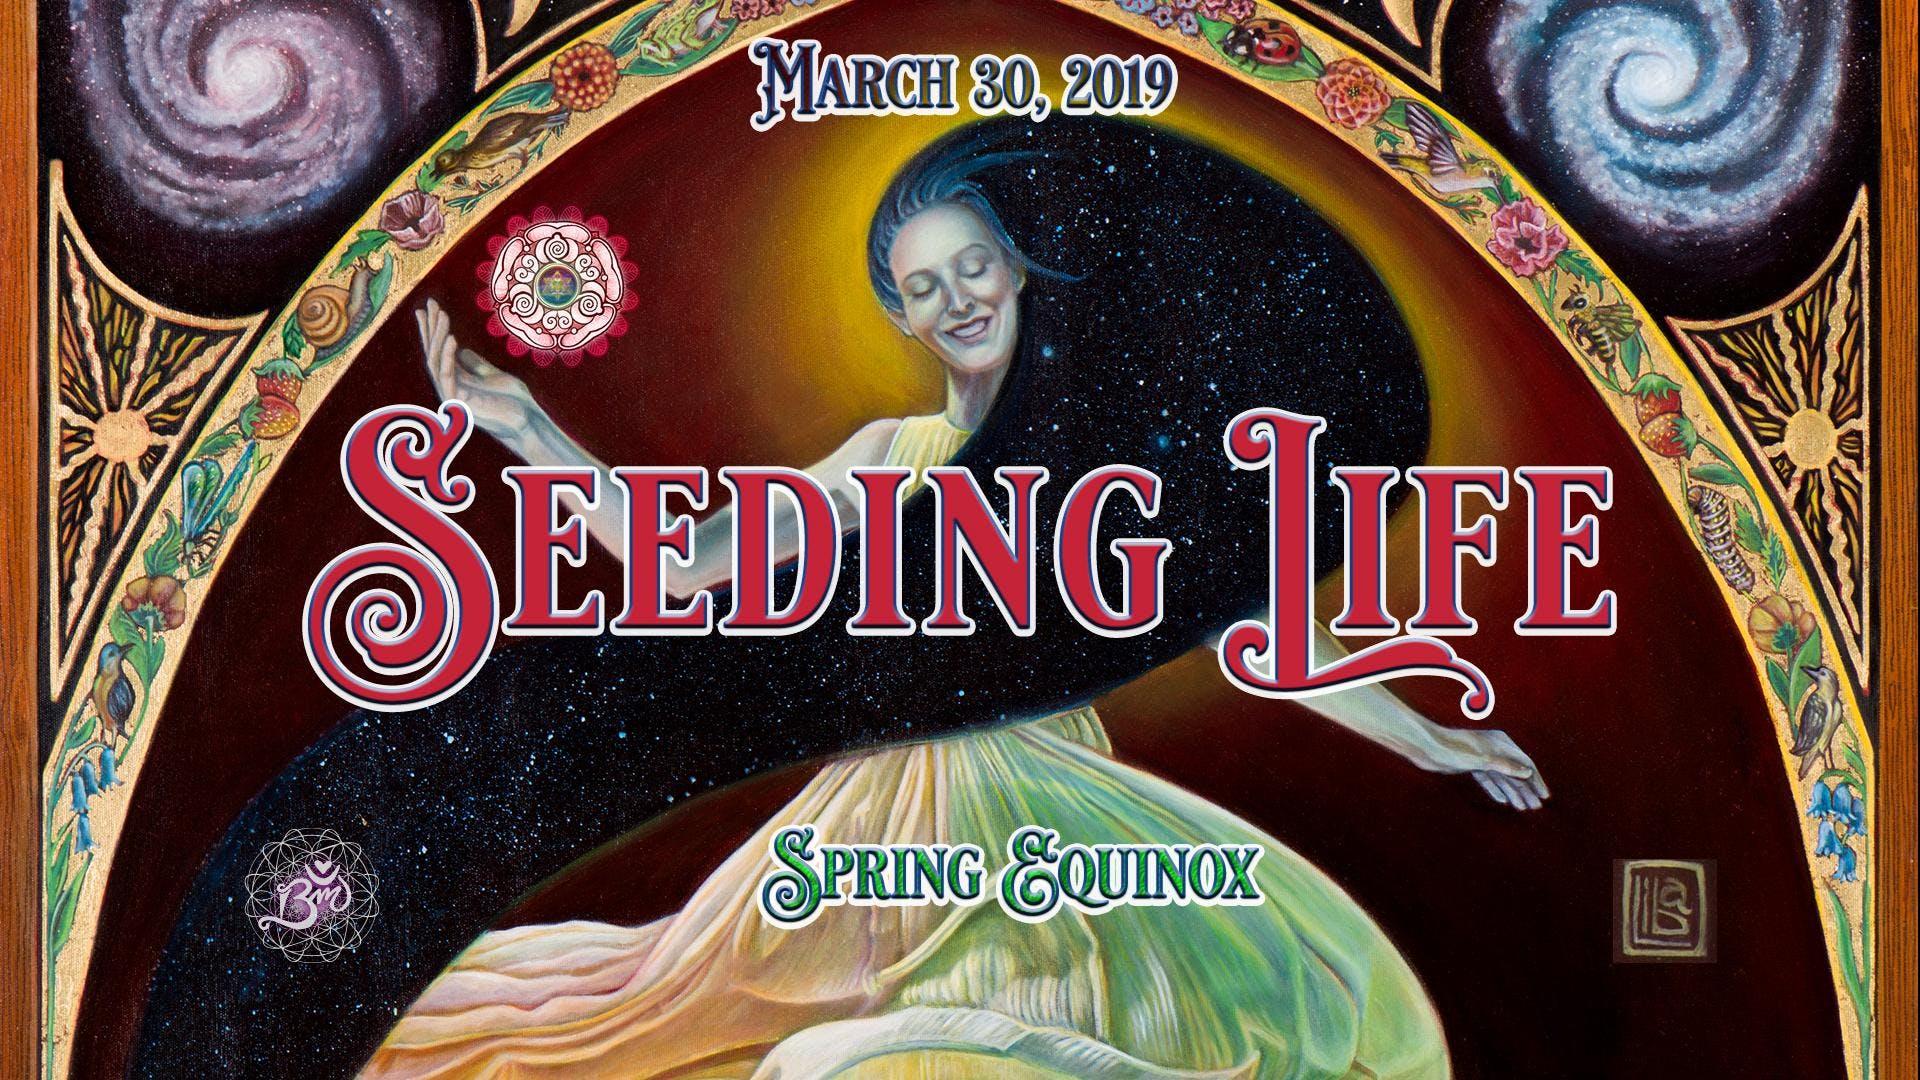 Seeding Life   Spring Equinox 2019   30 MAR 2019 1920x1080